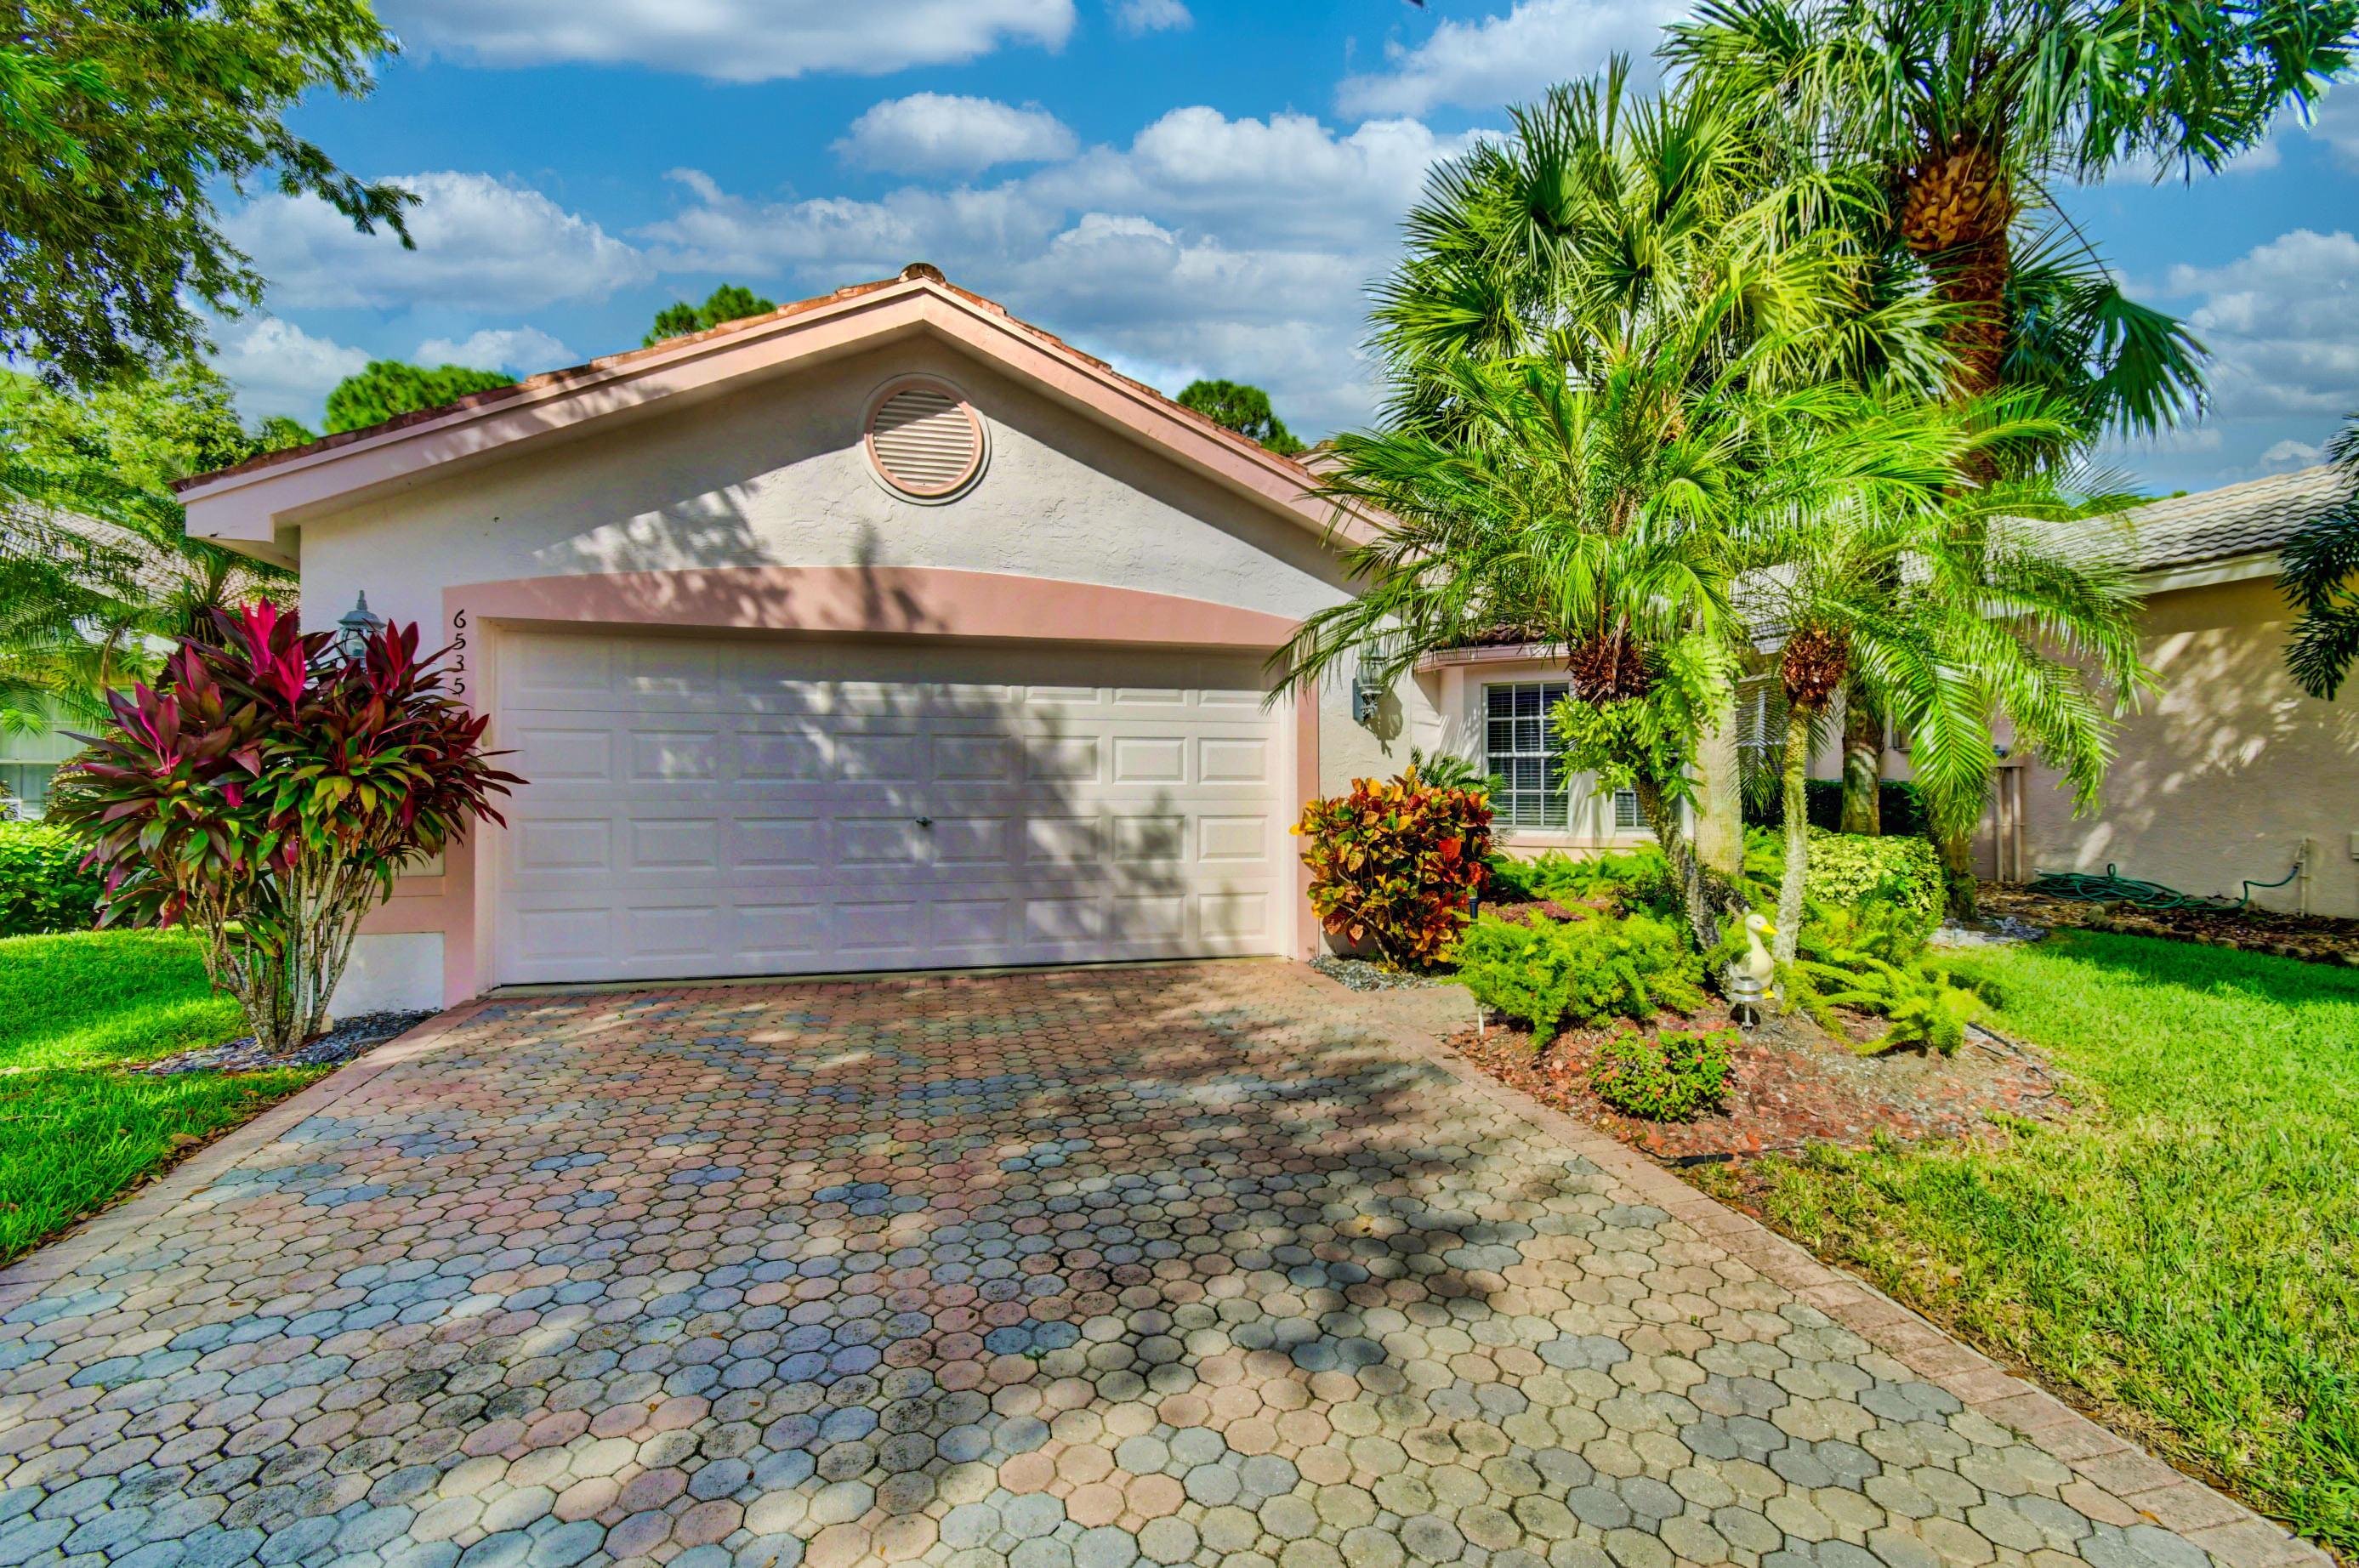 Photo of  Boynton Beach, FL 33437 MLS RX-10667286